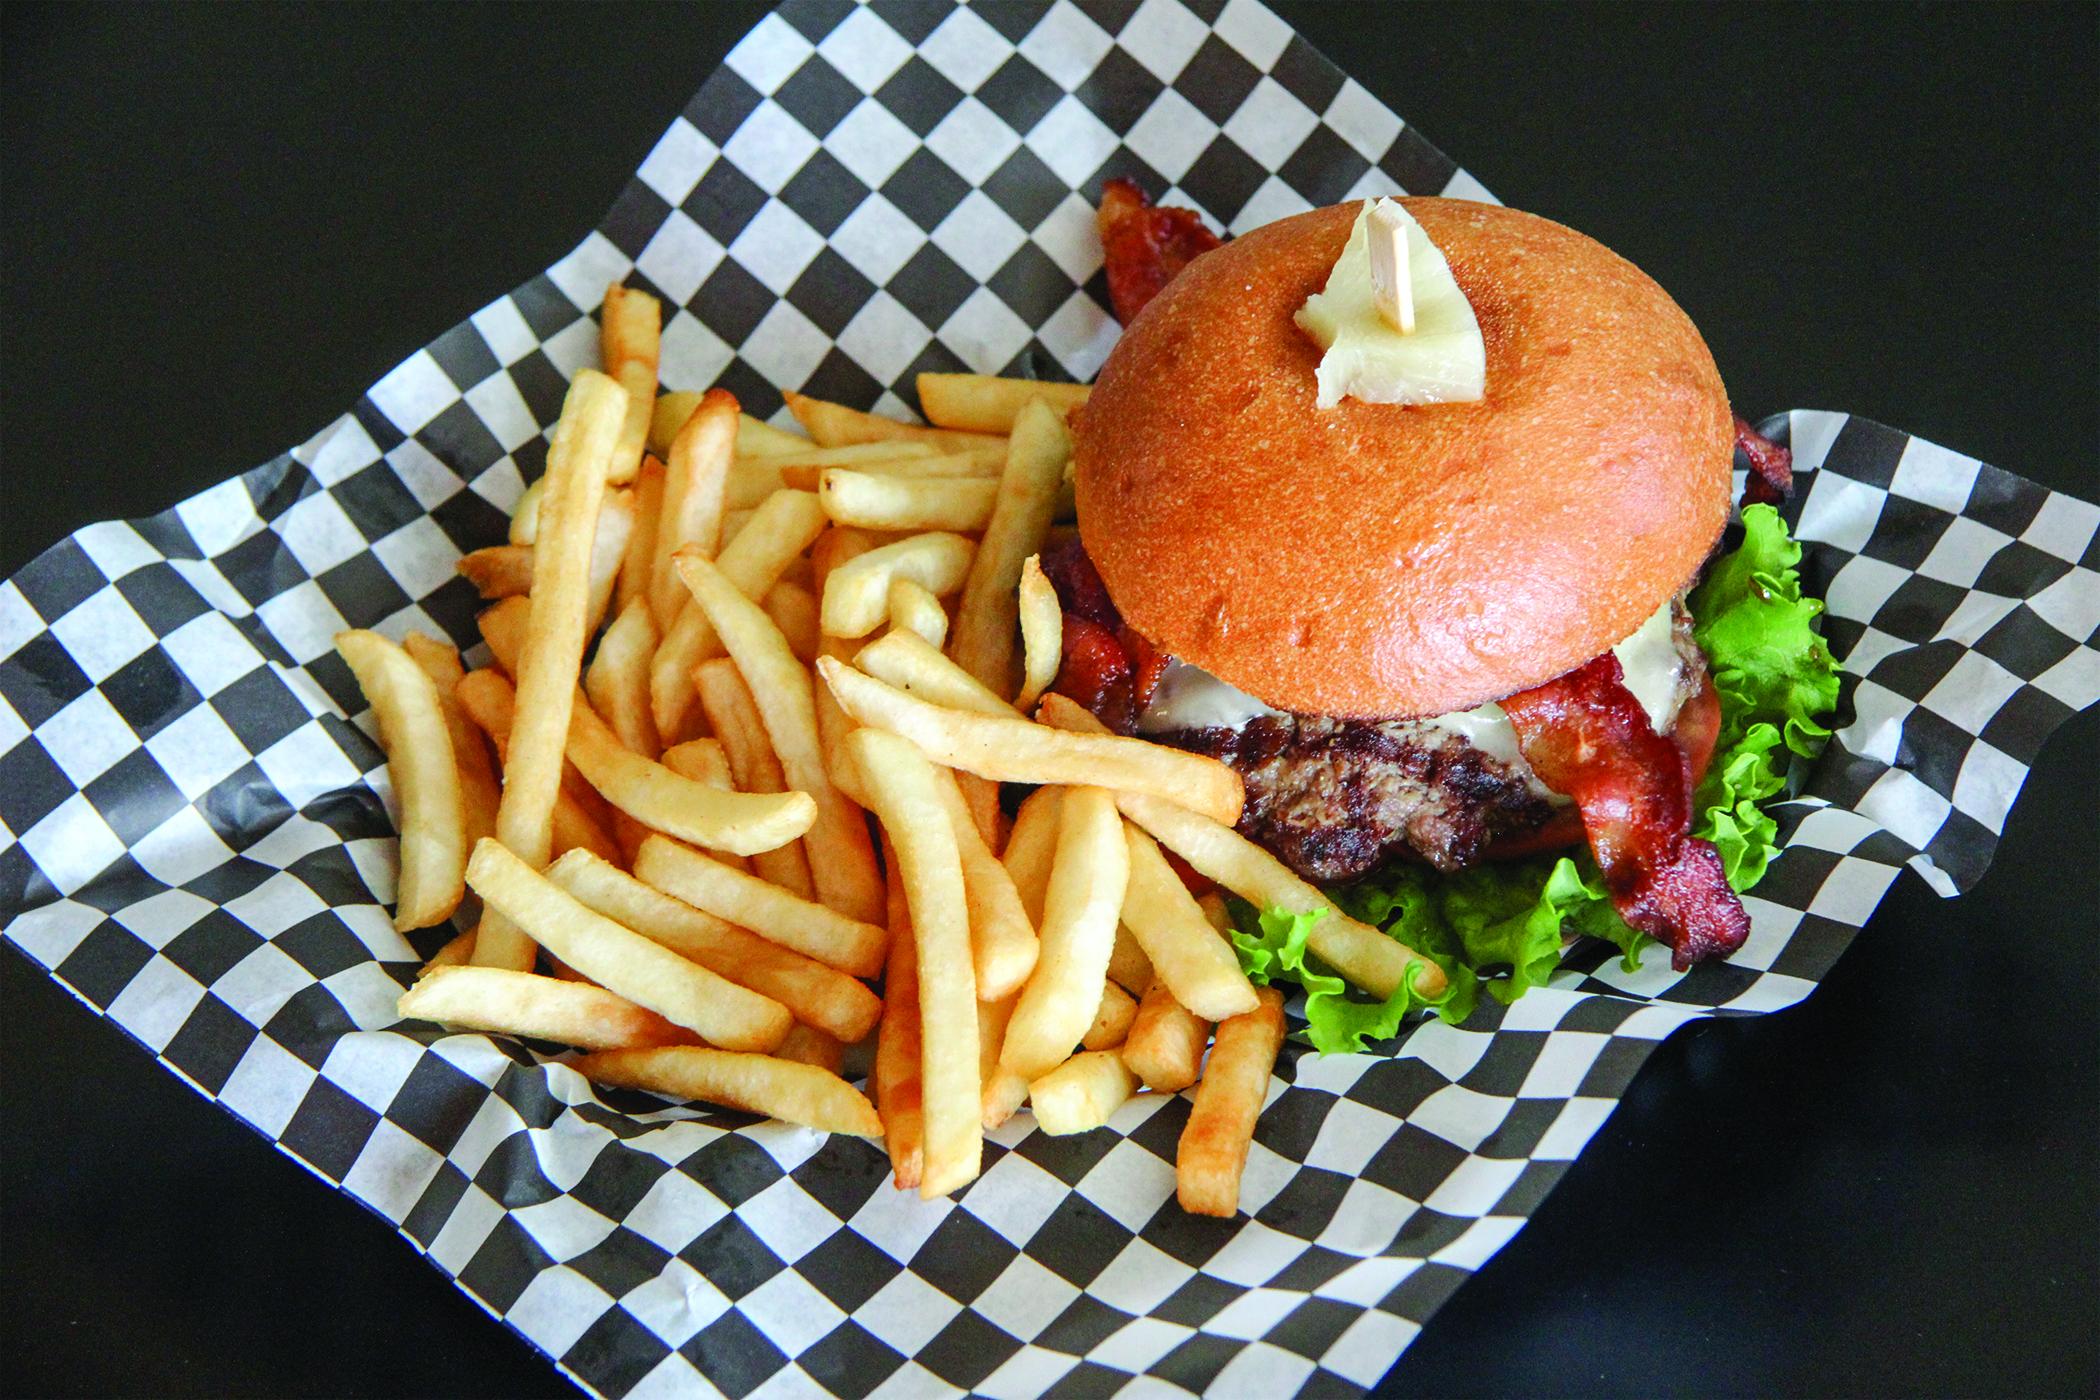 Big Island Burger